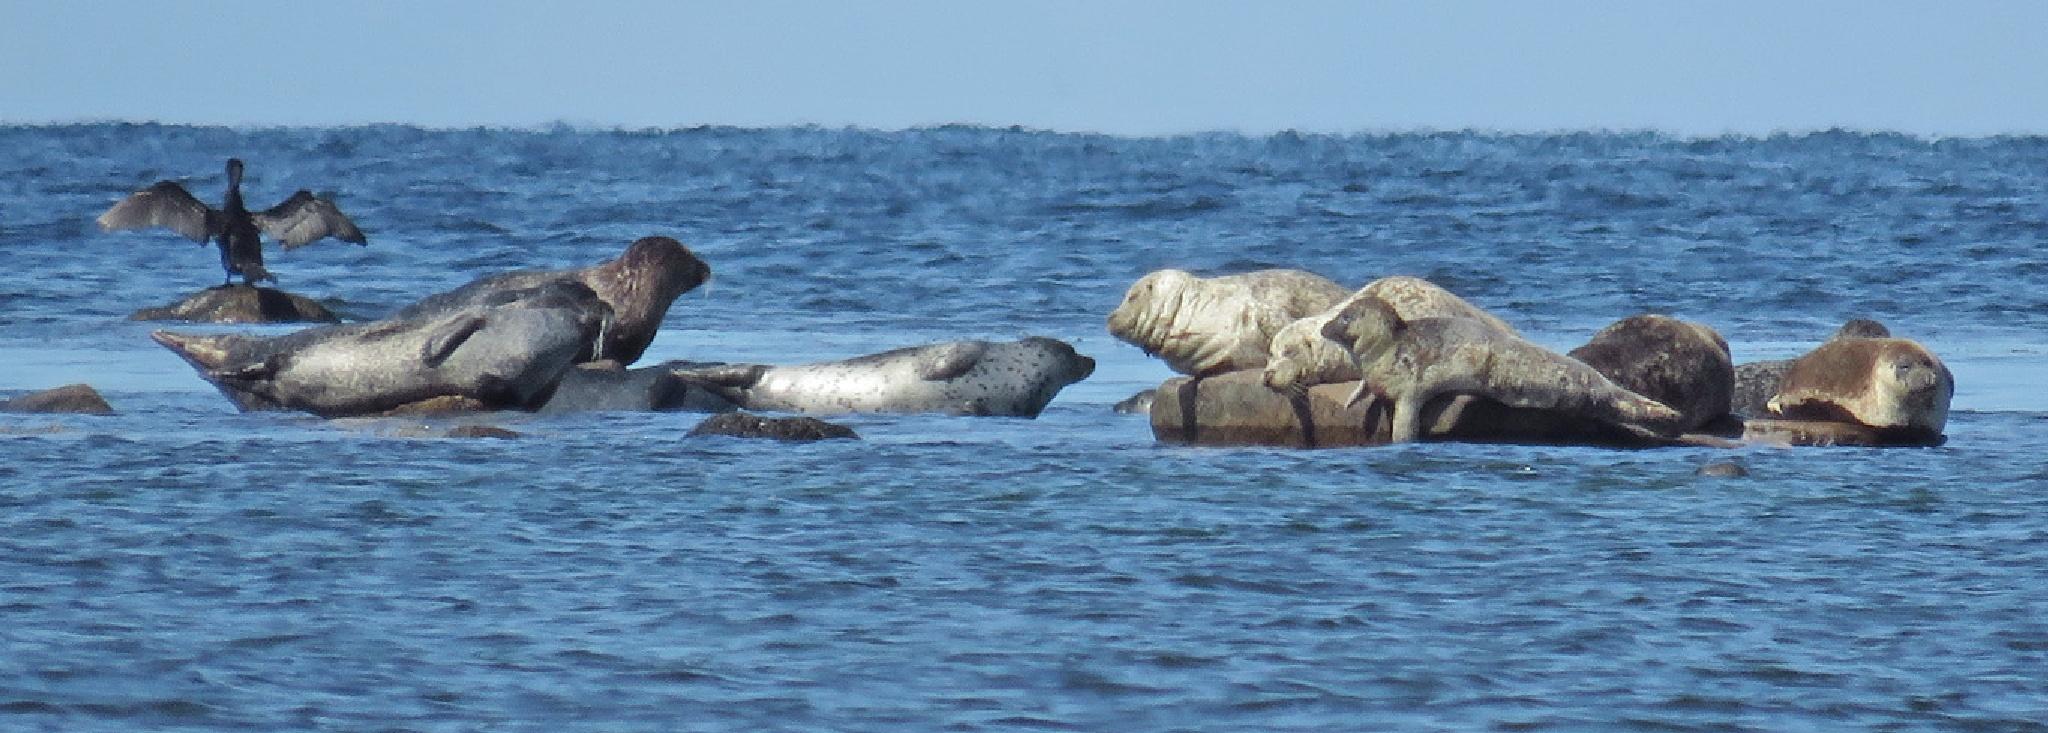 Common seal 88  by Dekayne